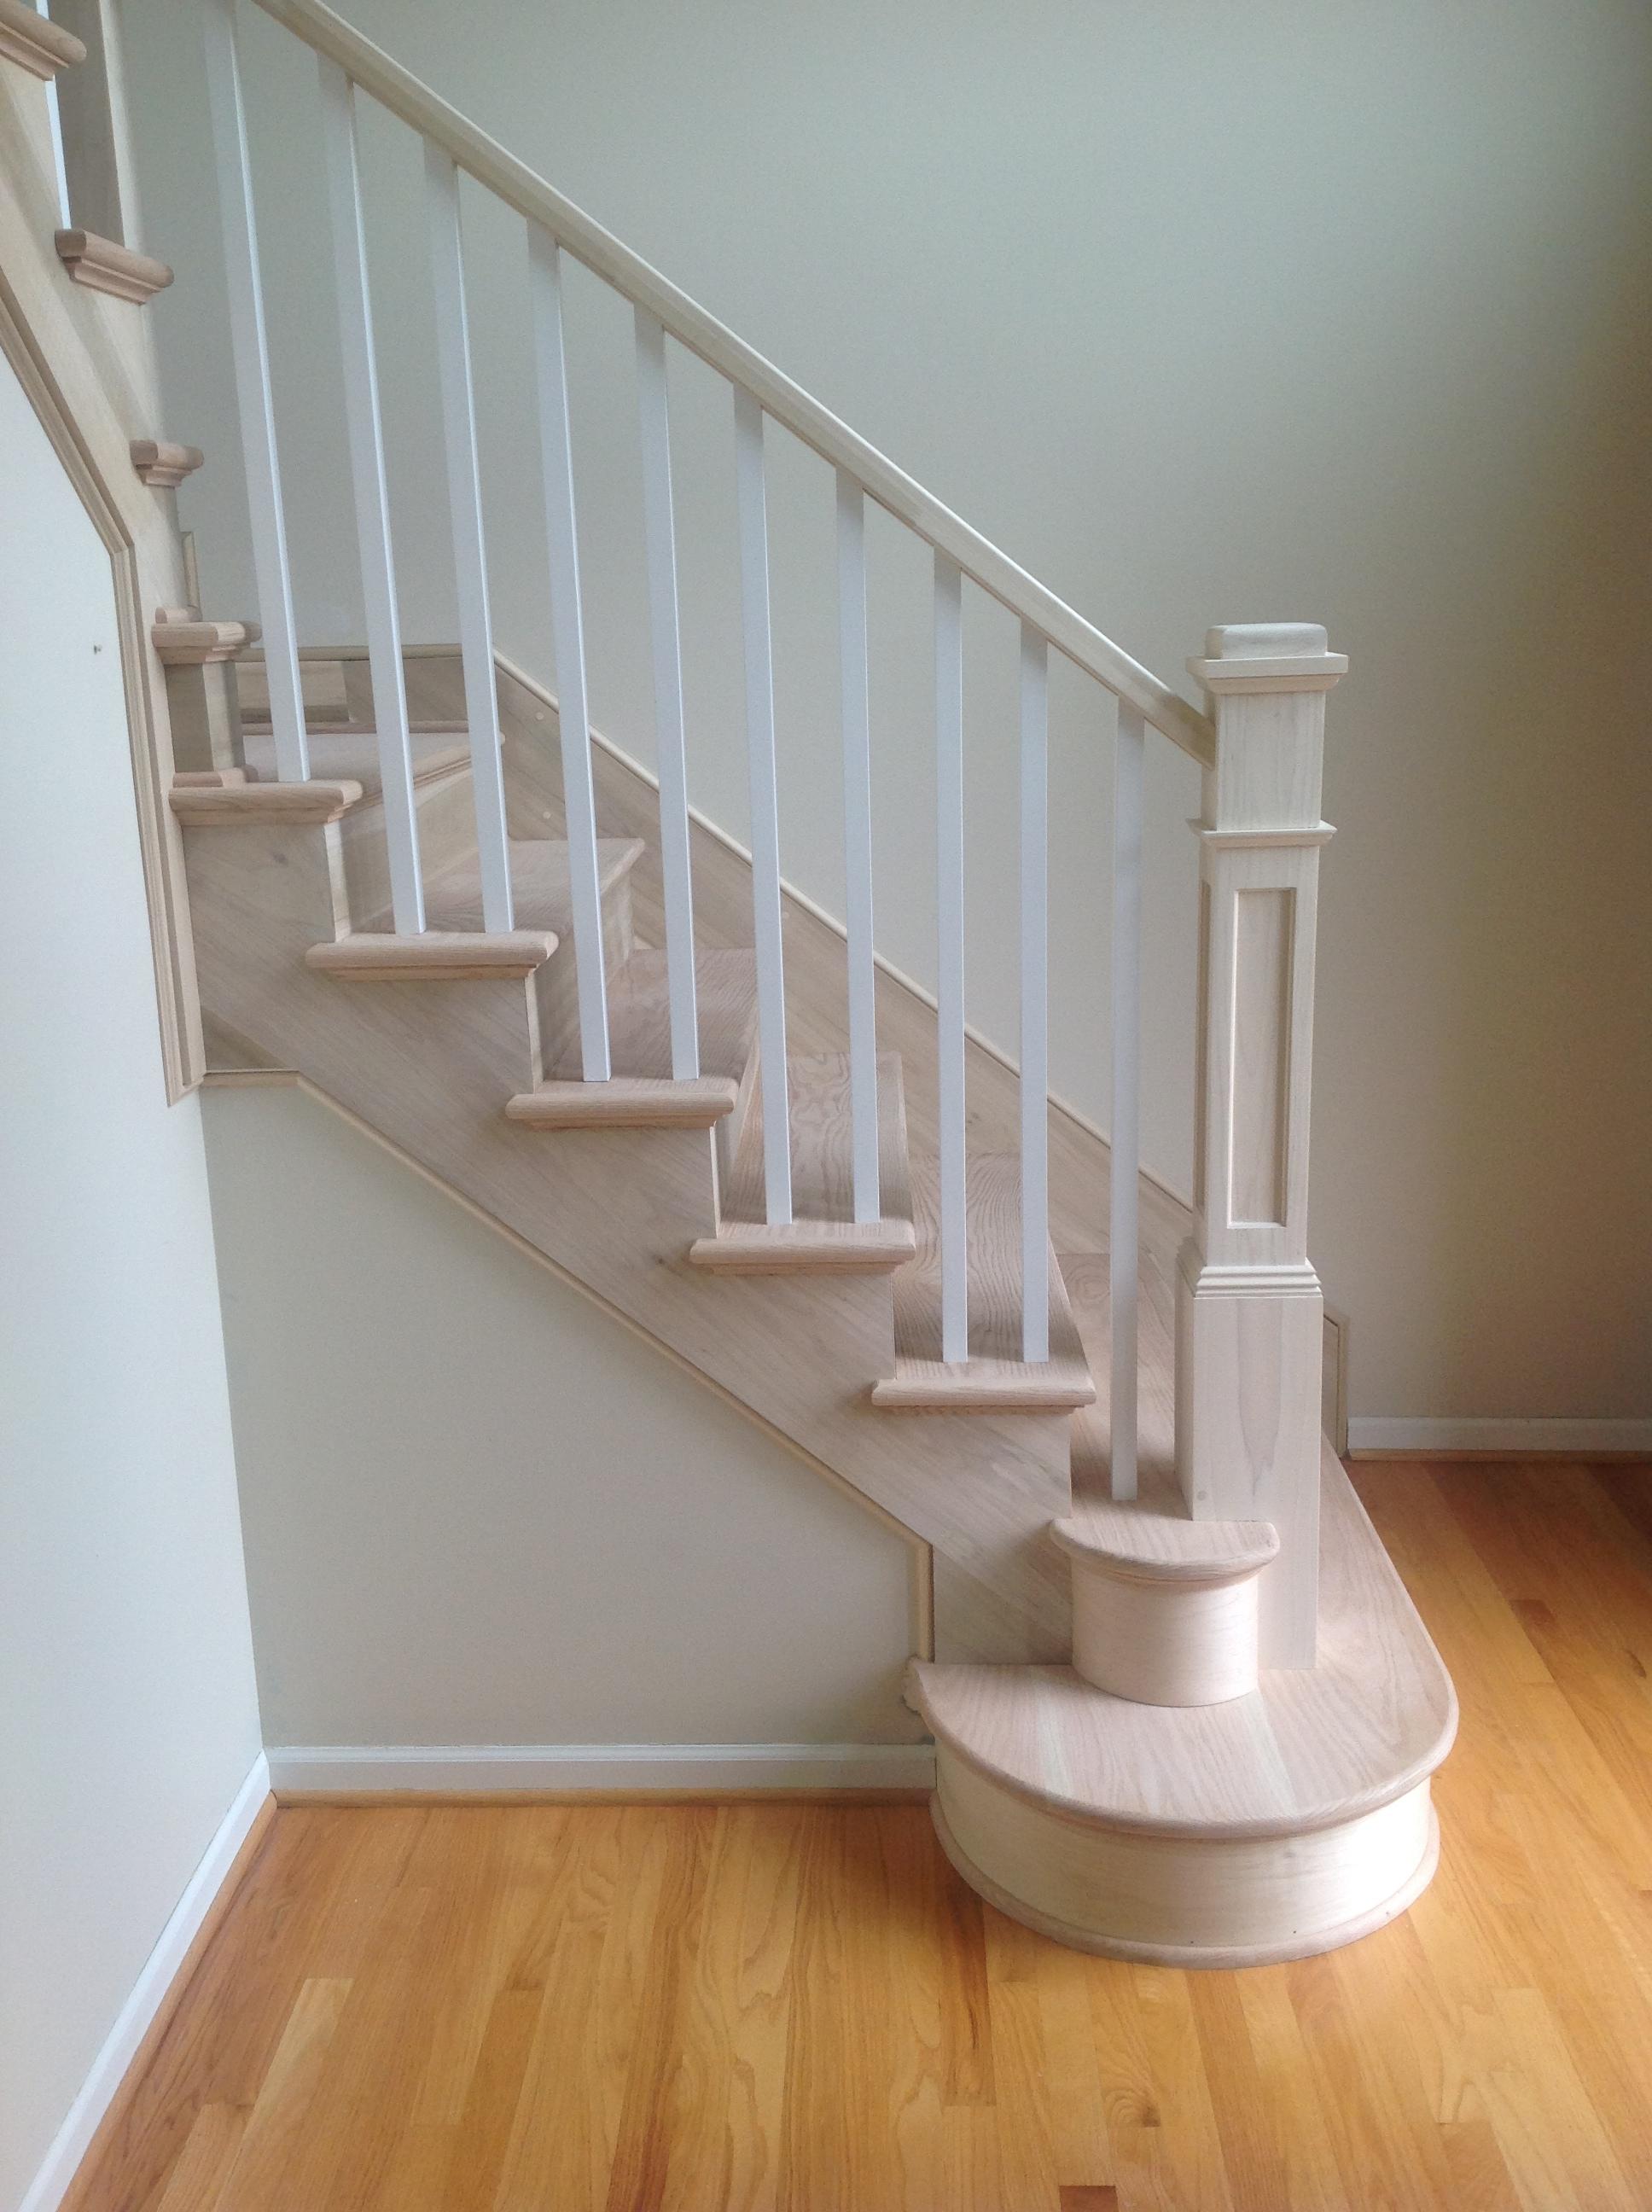 Stair pics 001.JPG